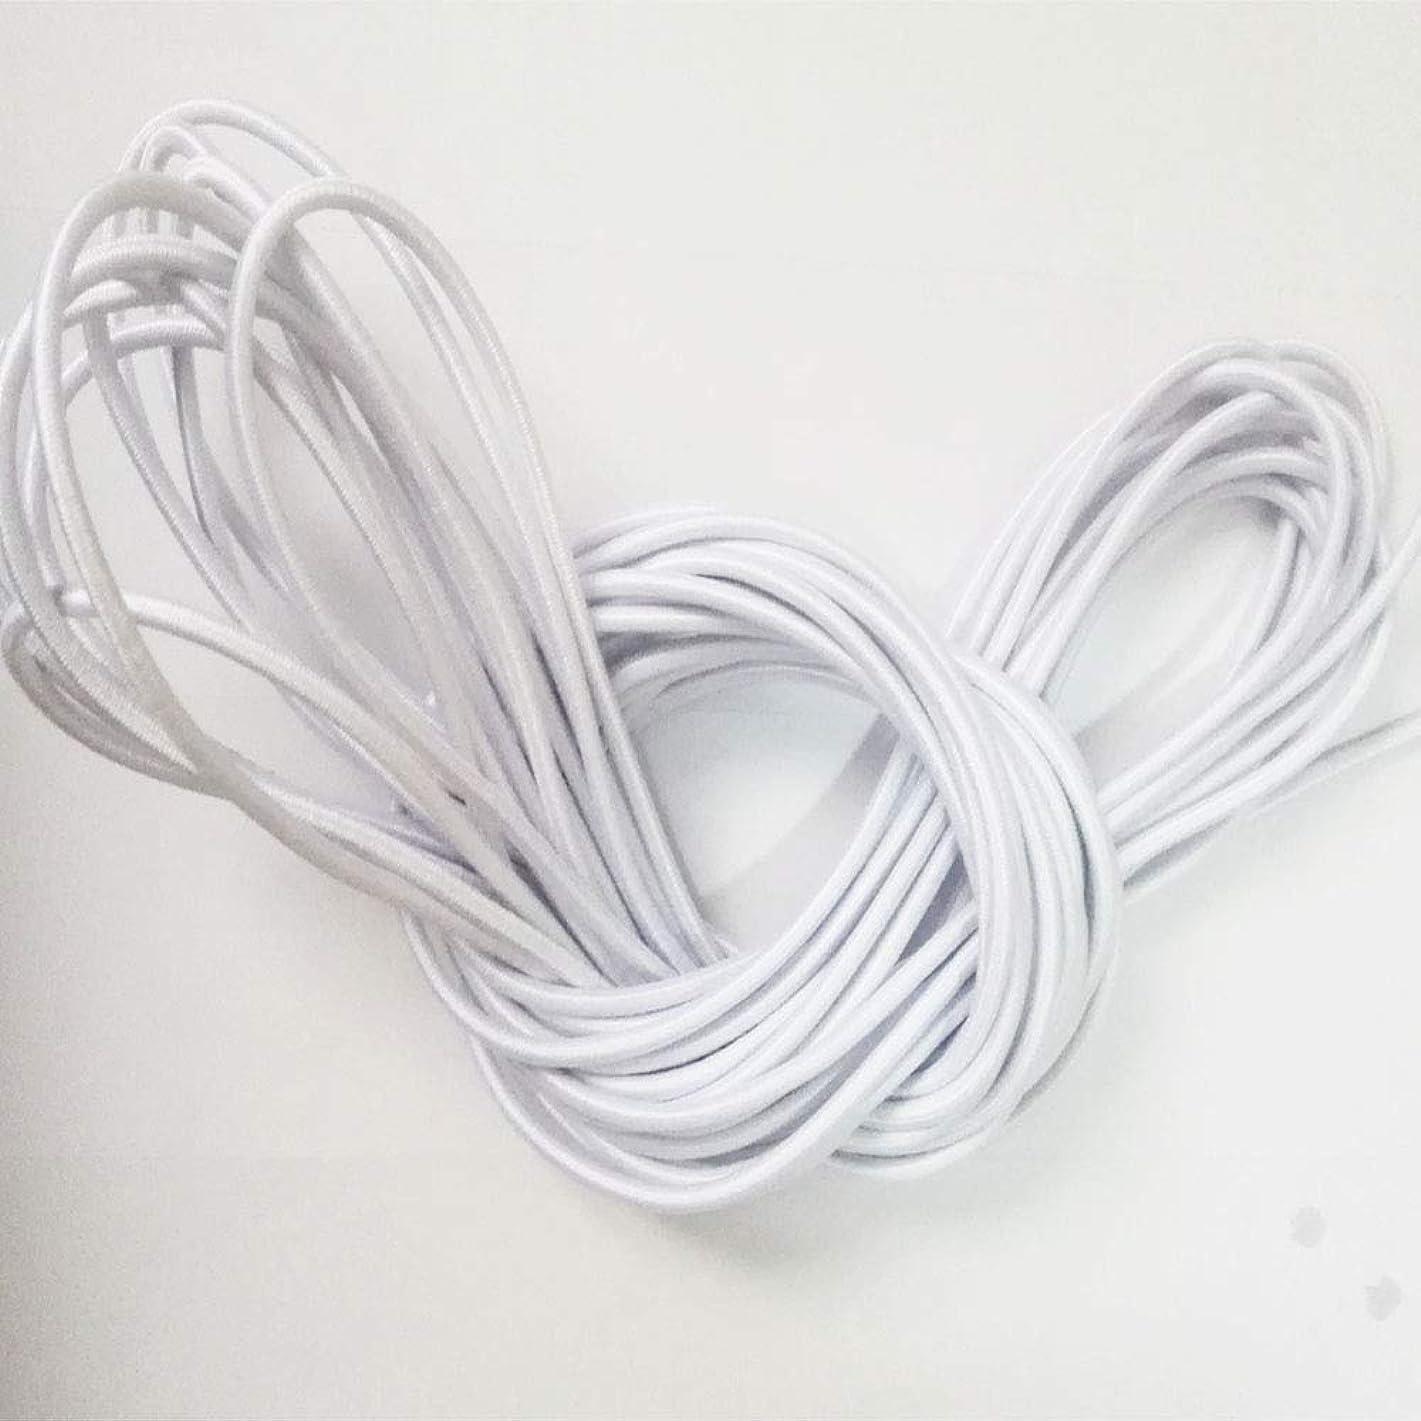 lusata 1/8-Inch 3mm White Heavy Stretch Round String Elastic Cord Cut of 10 Yards